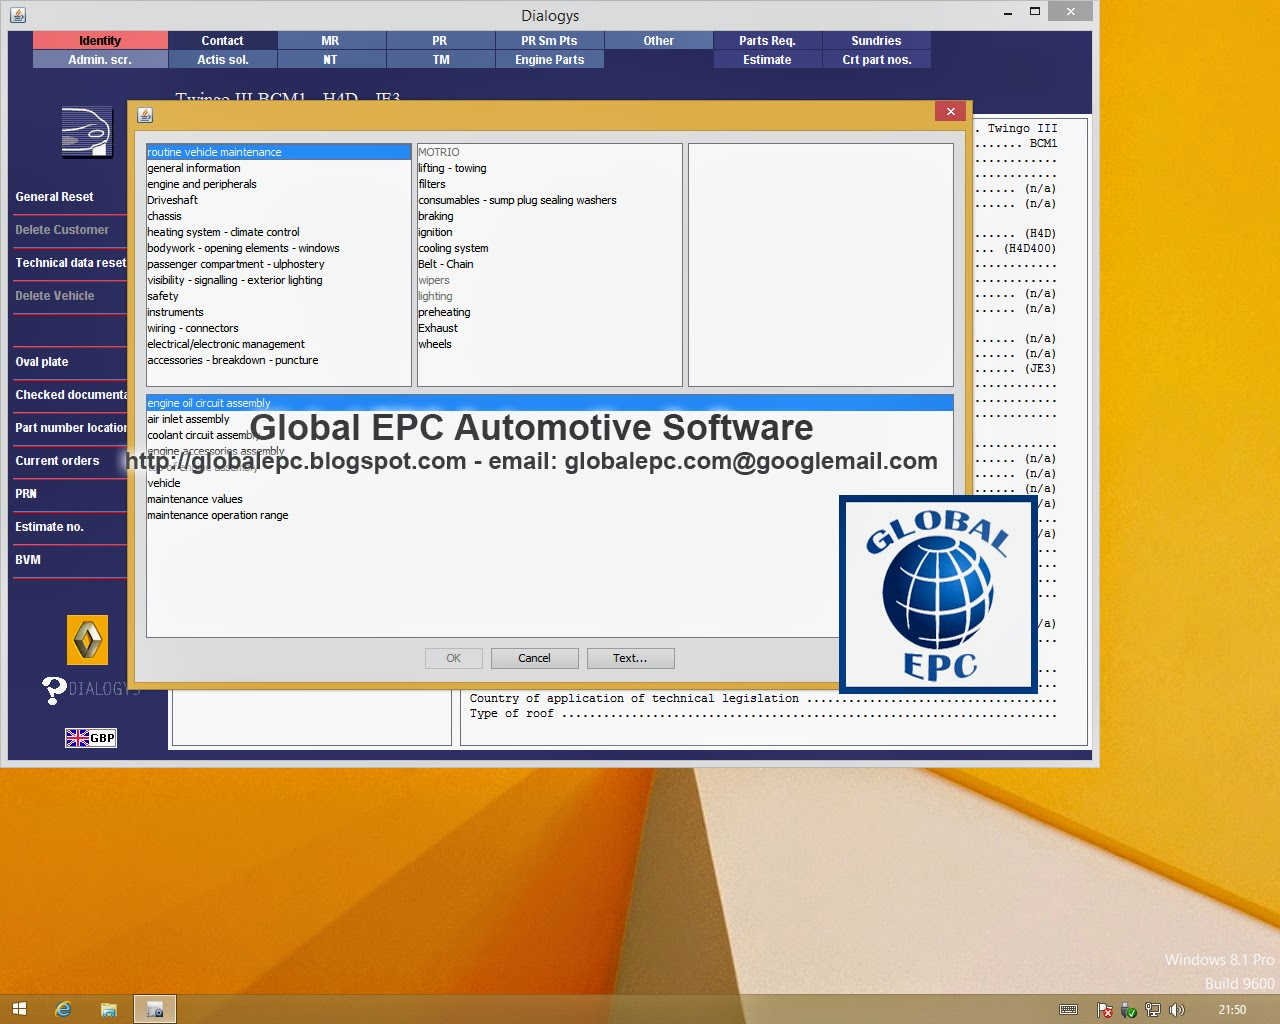 haynes manual renault megane free download